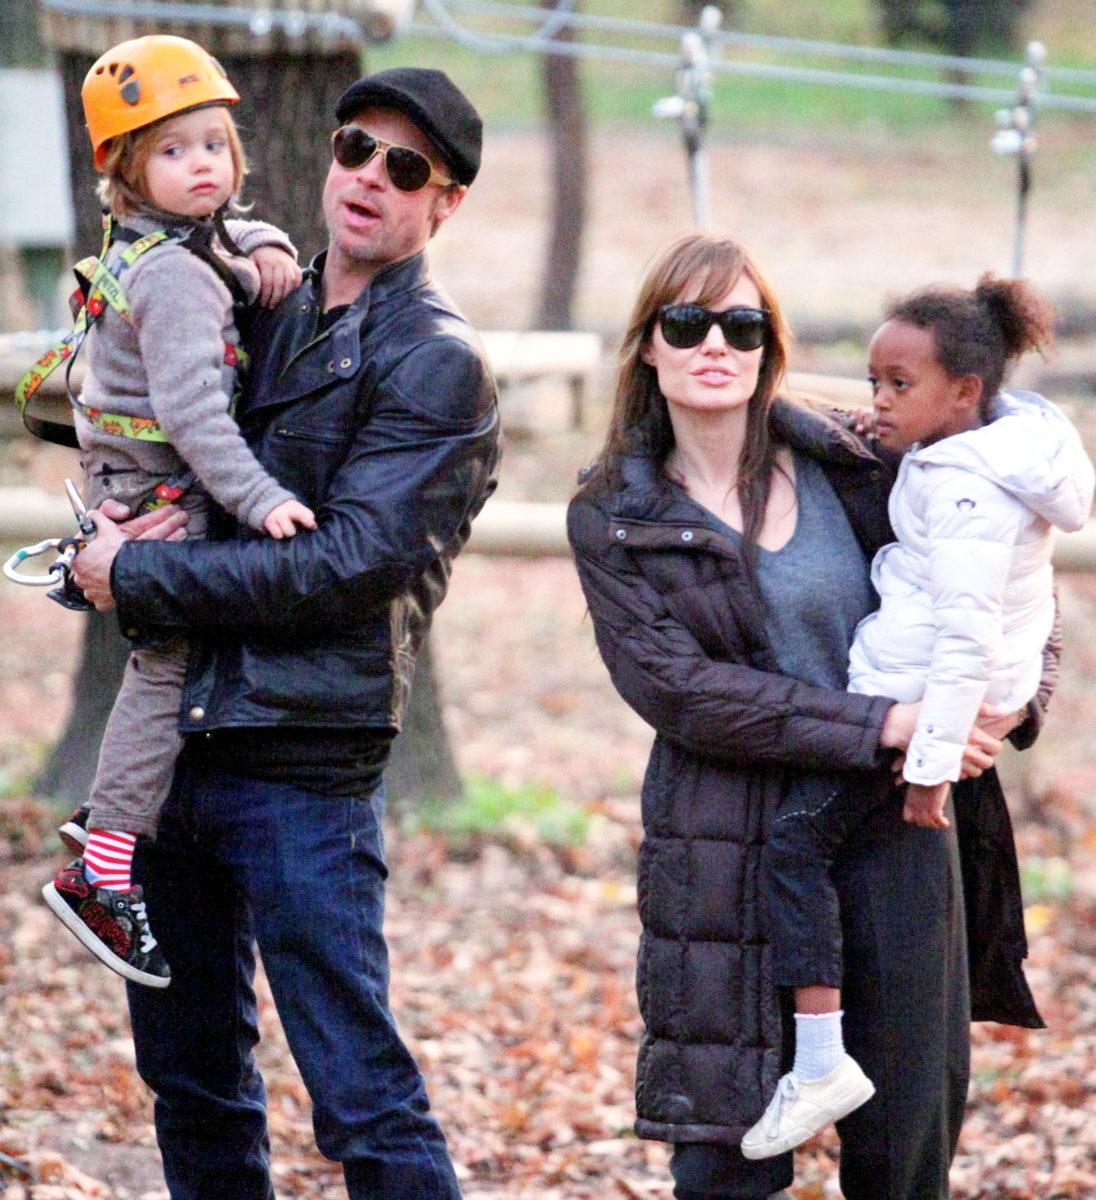 angelina jolie on no longer directing movies amid divorce